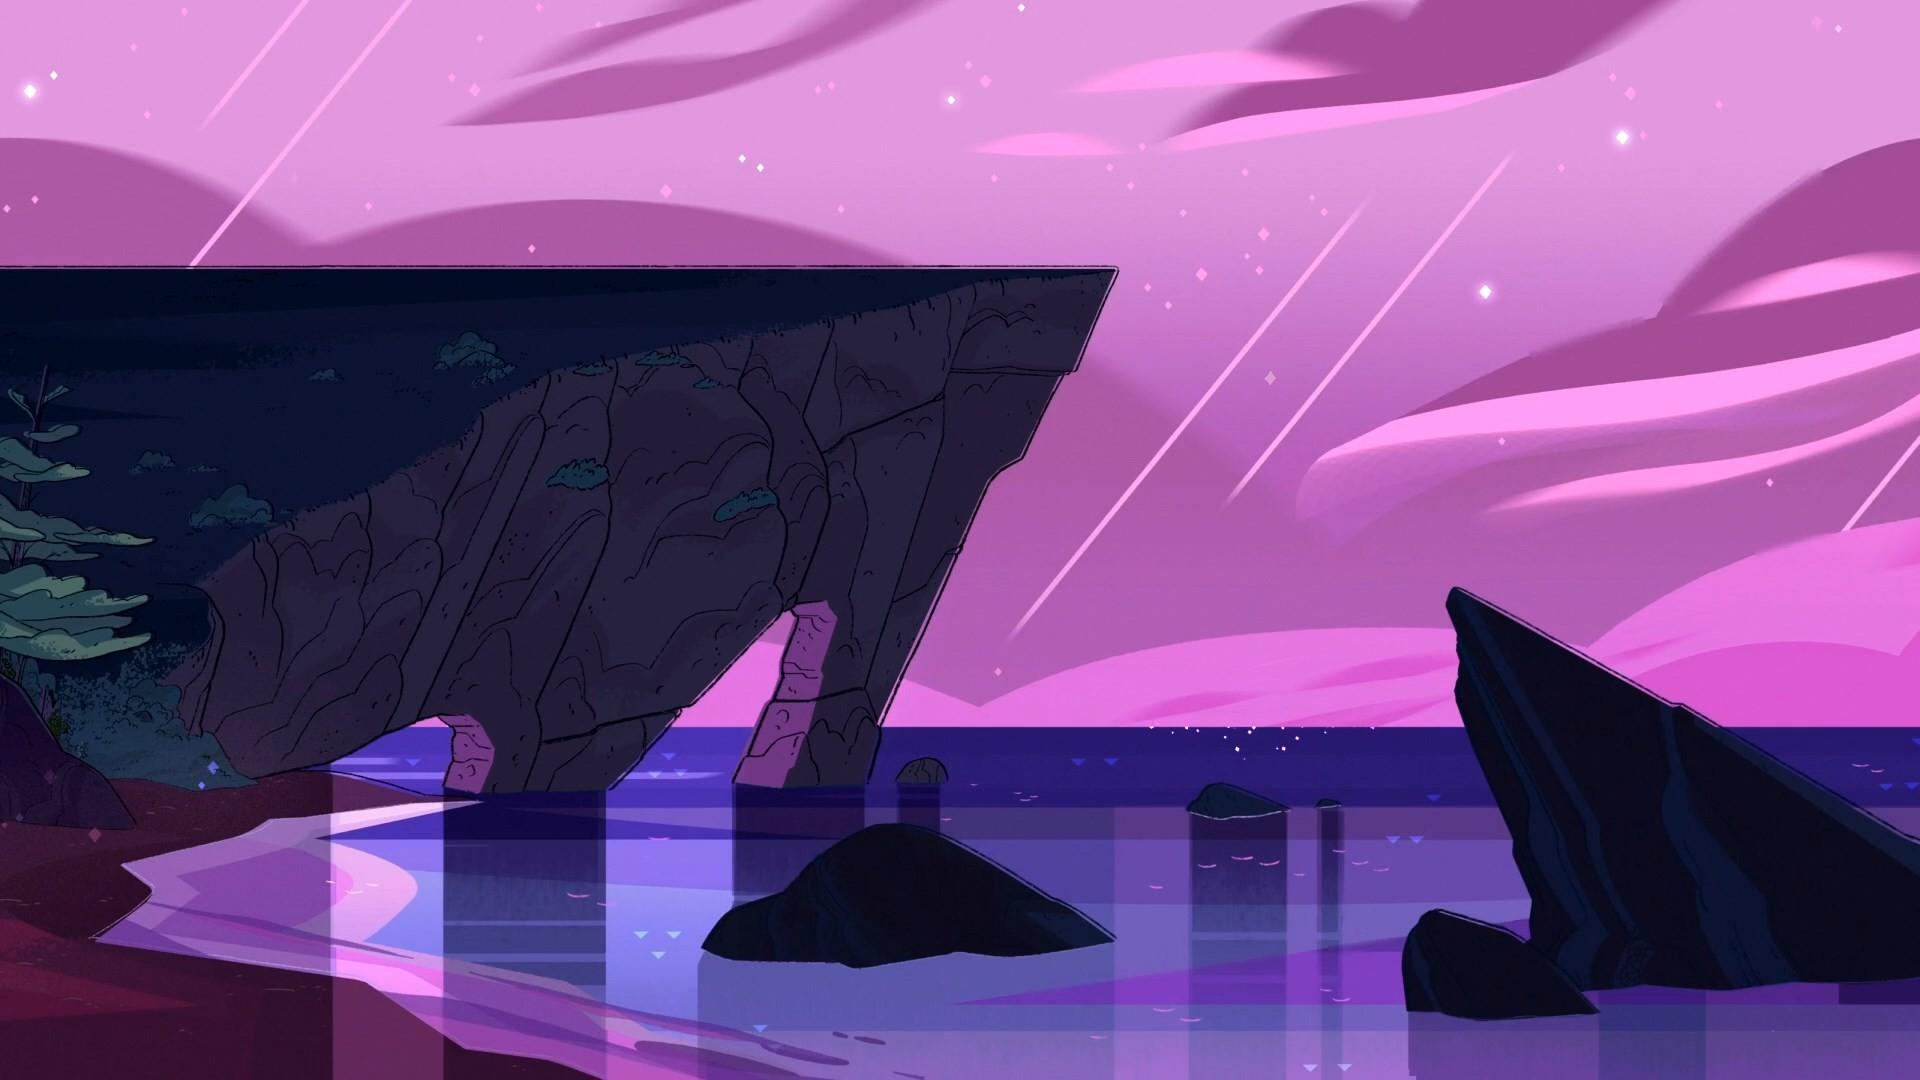 steven universe backround: Full HD Pictures – steven universe category